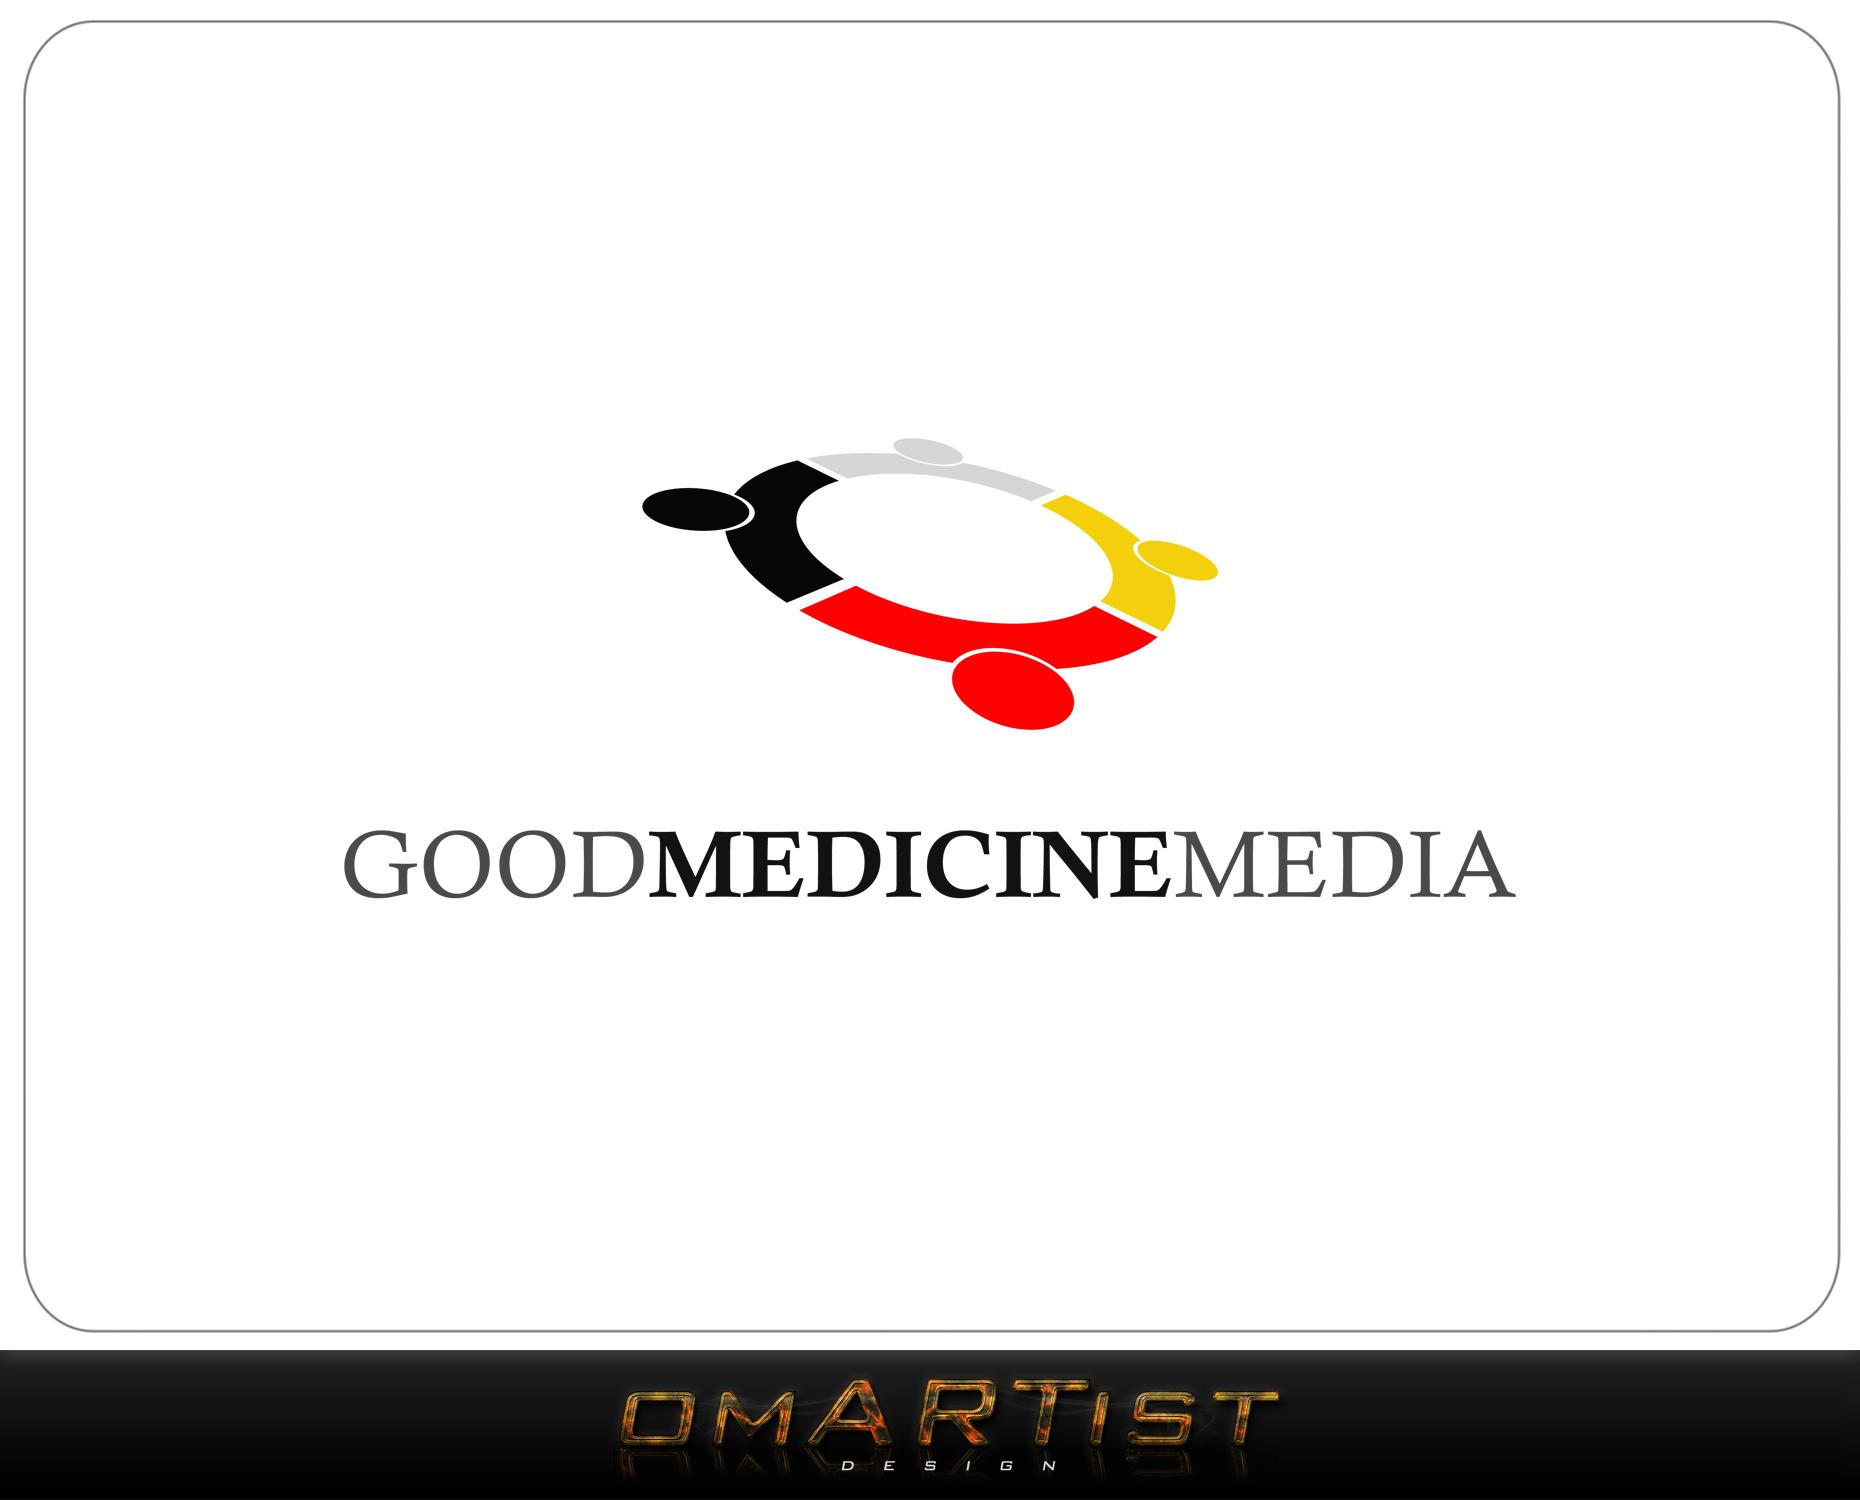 Logo Design by omARTist - Entry No. 110 in the Logo Design Contest Good Medicine Media Logo Design.